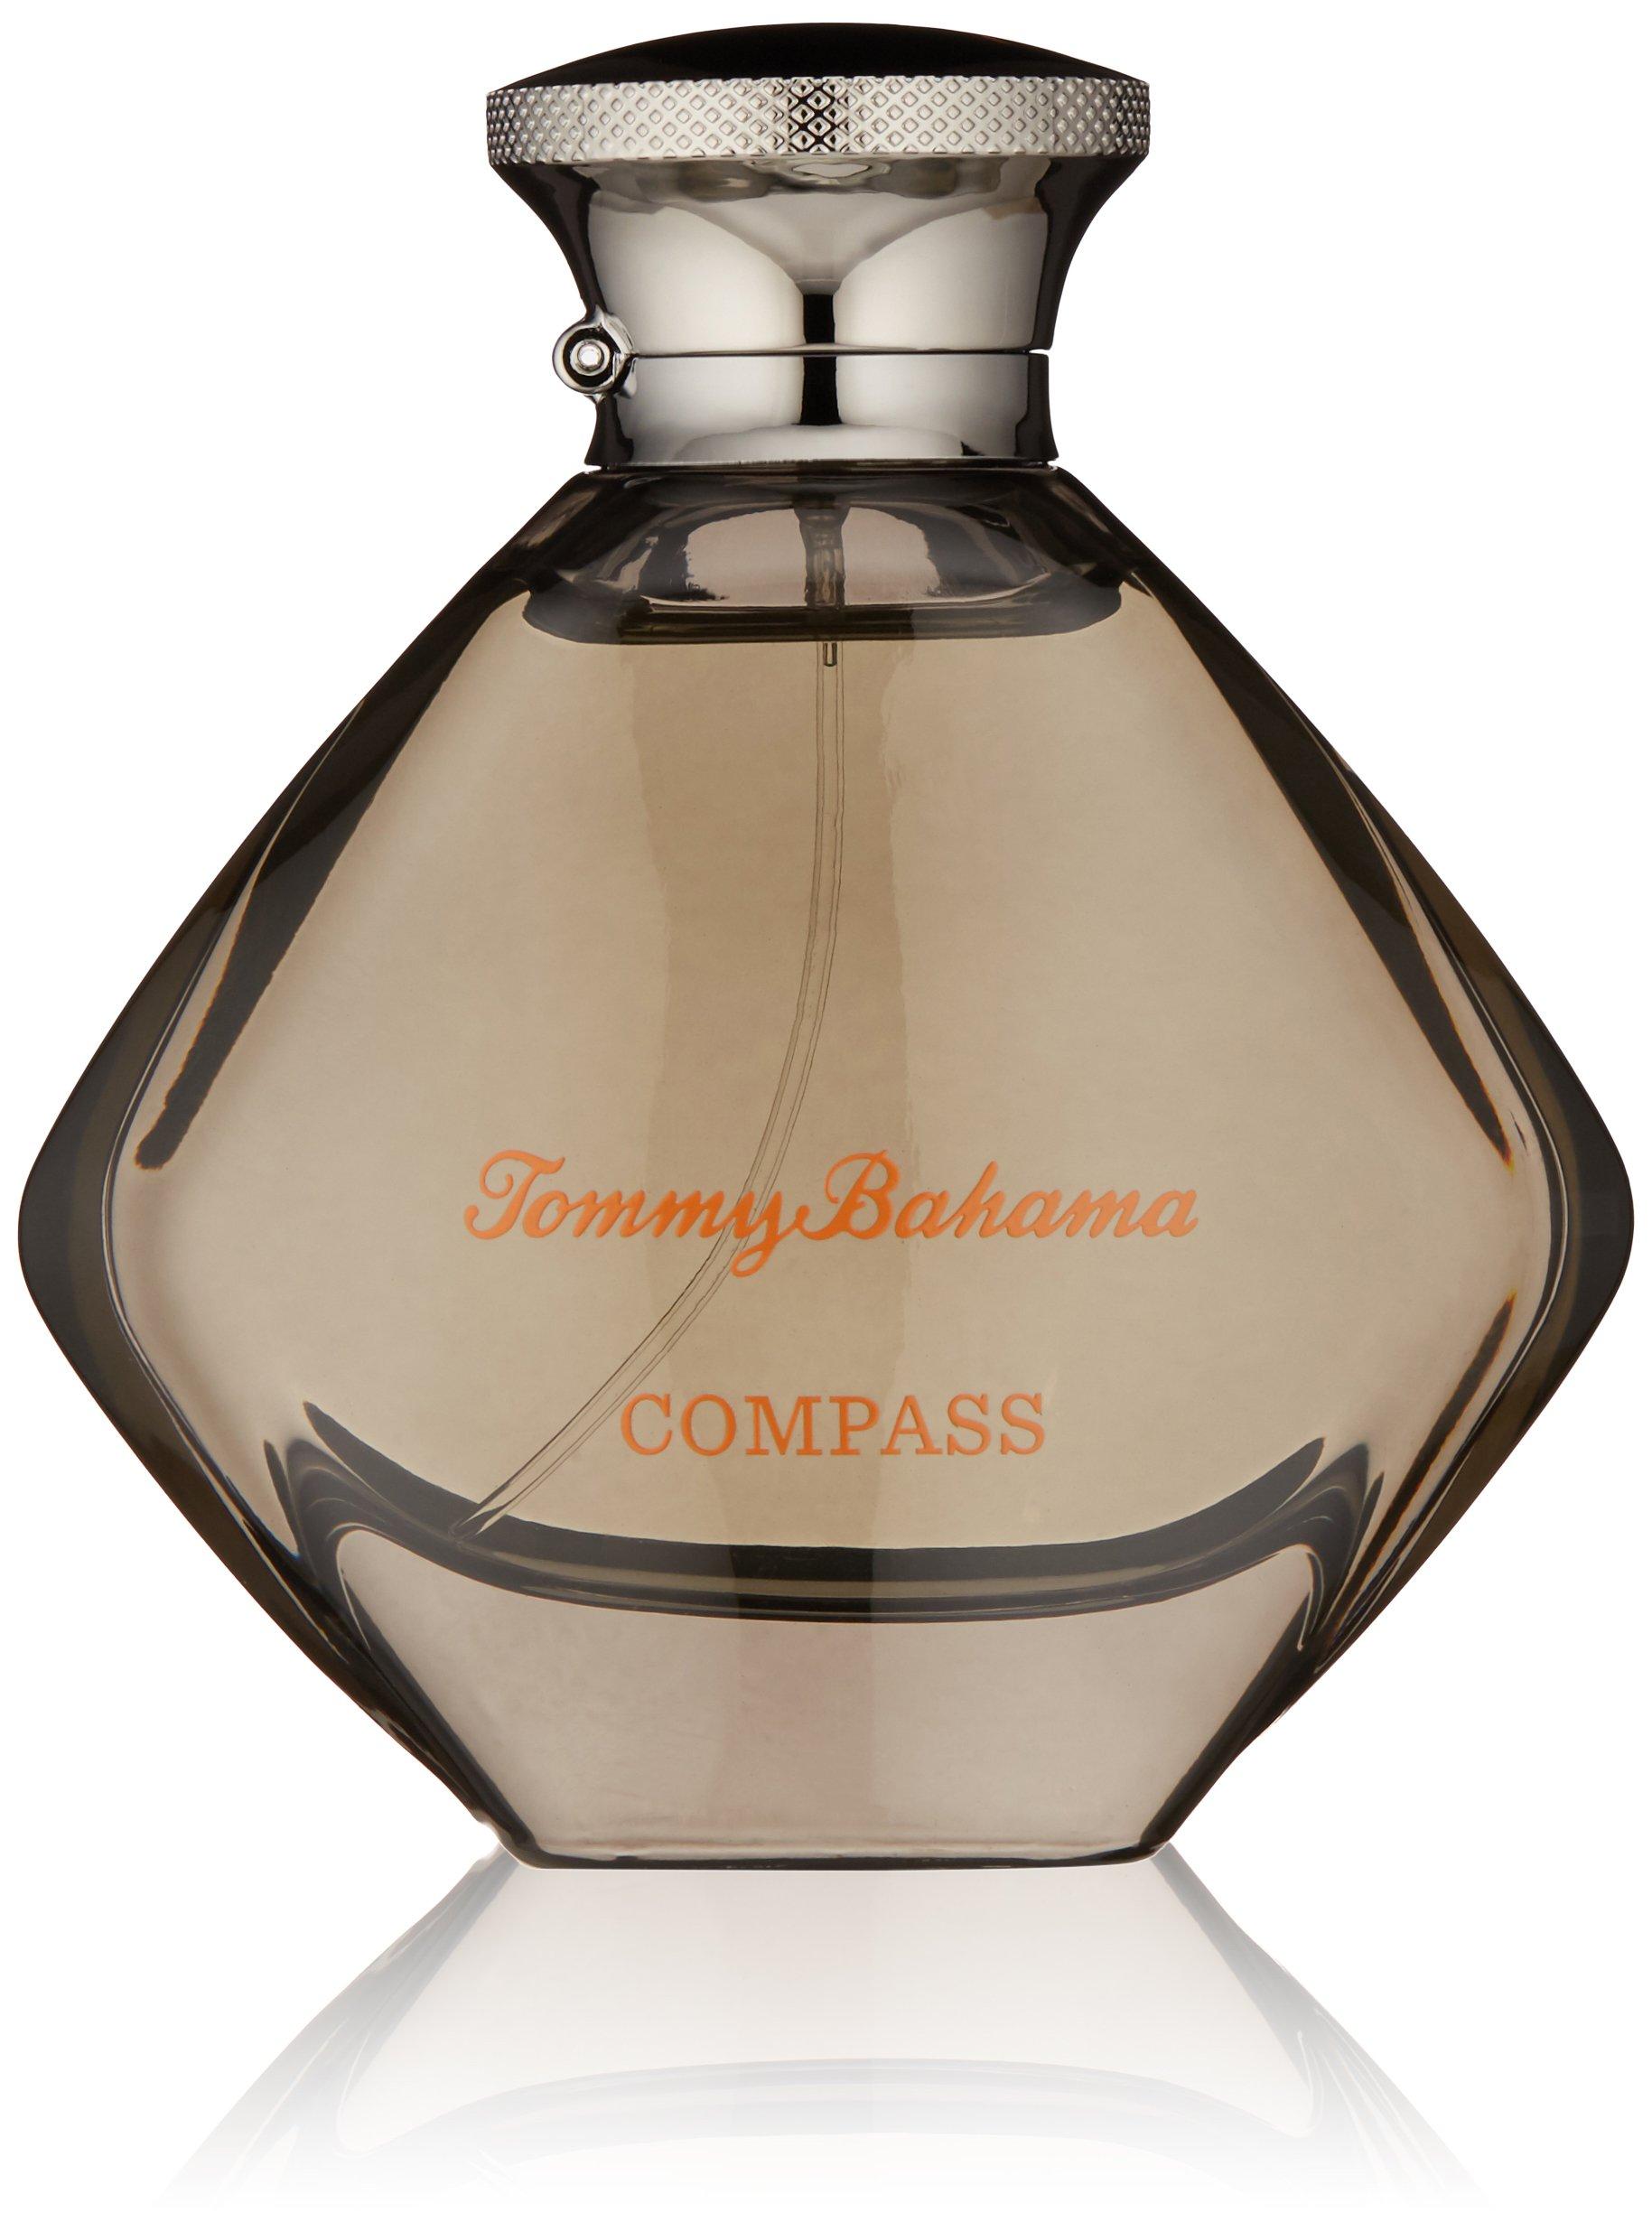 Tommy Bahama Compass Cologne, 3.4 Fl Oz